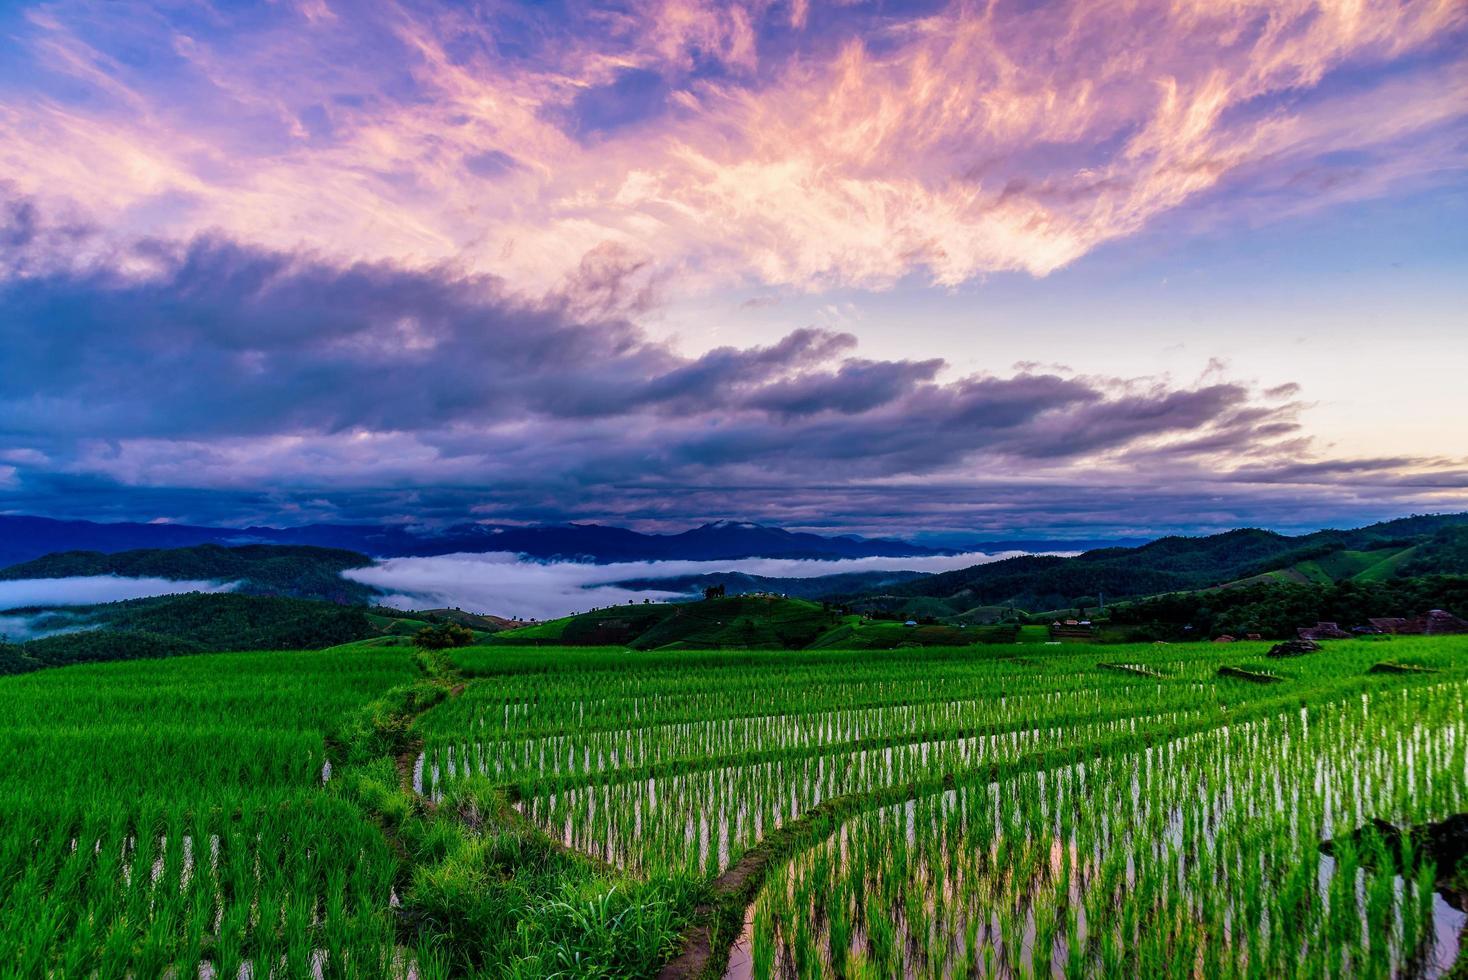 Campos de terrazas de arroz en la aldea de pa bong piang chiang mai, tailandia. foto